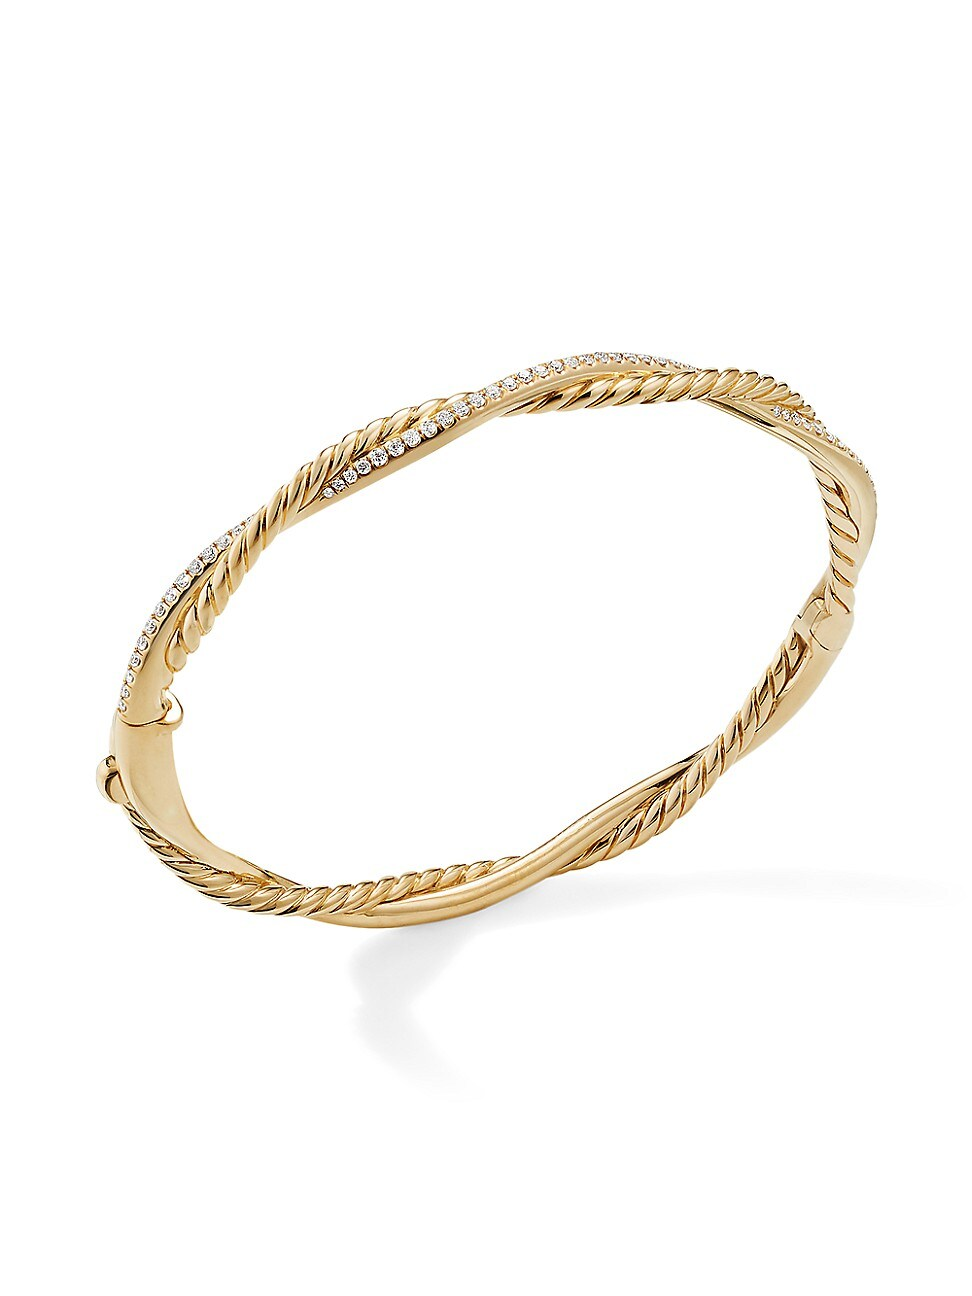 David Yurman Bracelets WOMEN'S PETITE INFINITY BRACELET IN 18K YELLOW GOLD WITH DIAMONDS